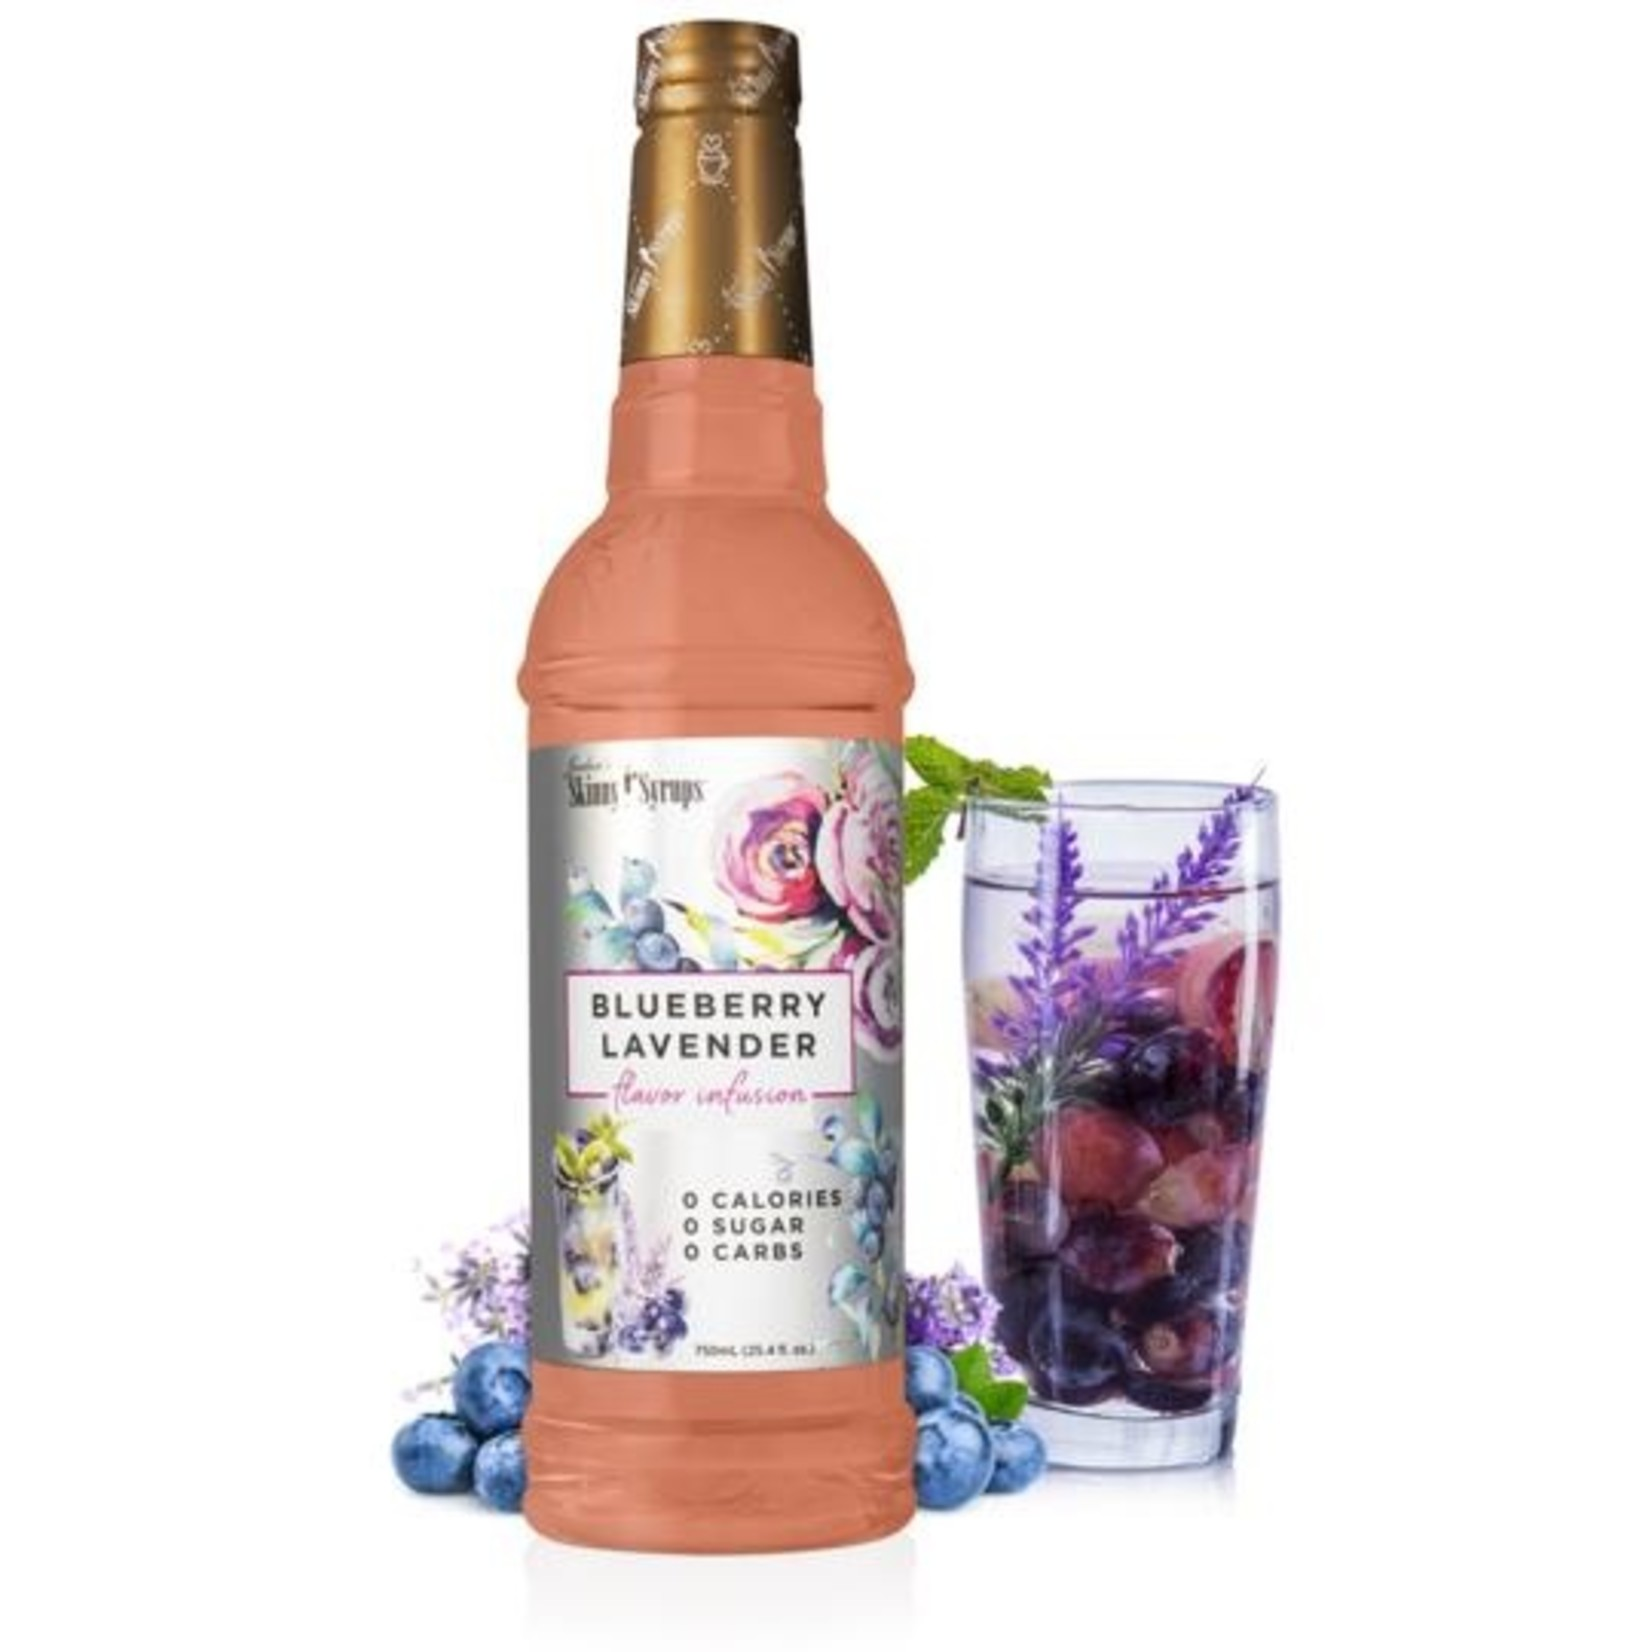 Jordan's Skinny Mixes Sugar Free Blueberry Lavender Syrup